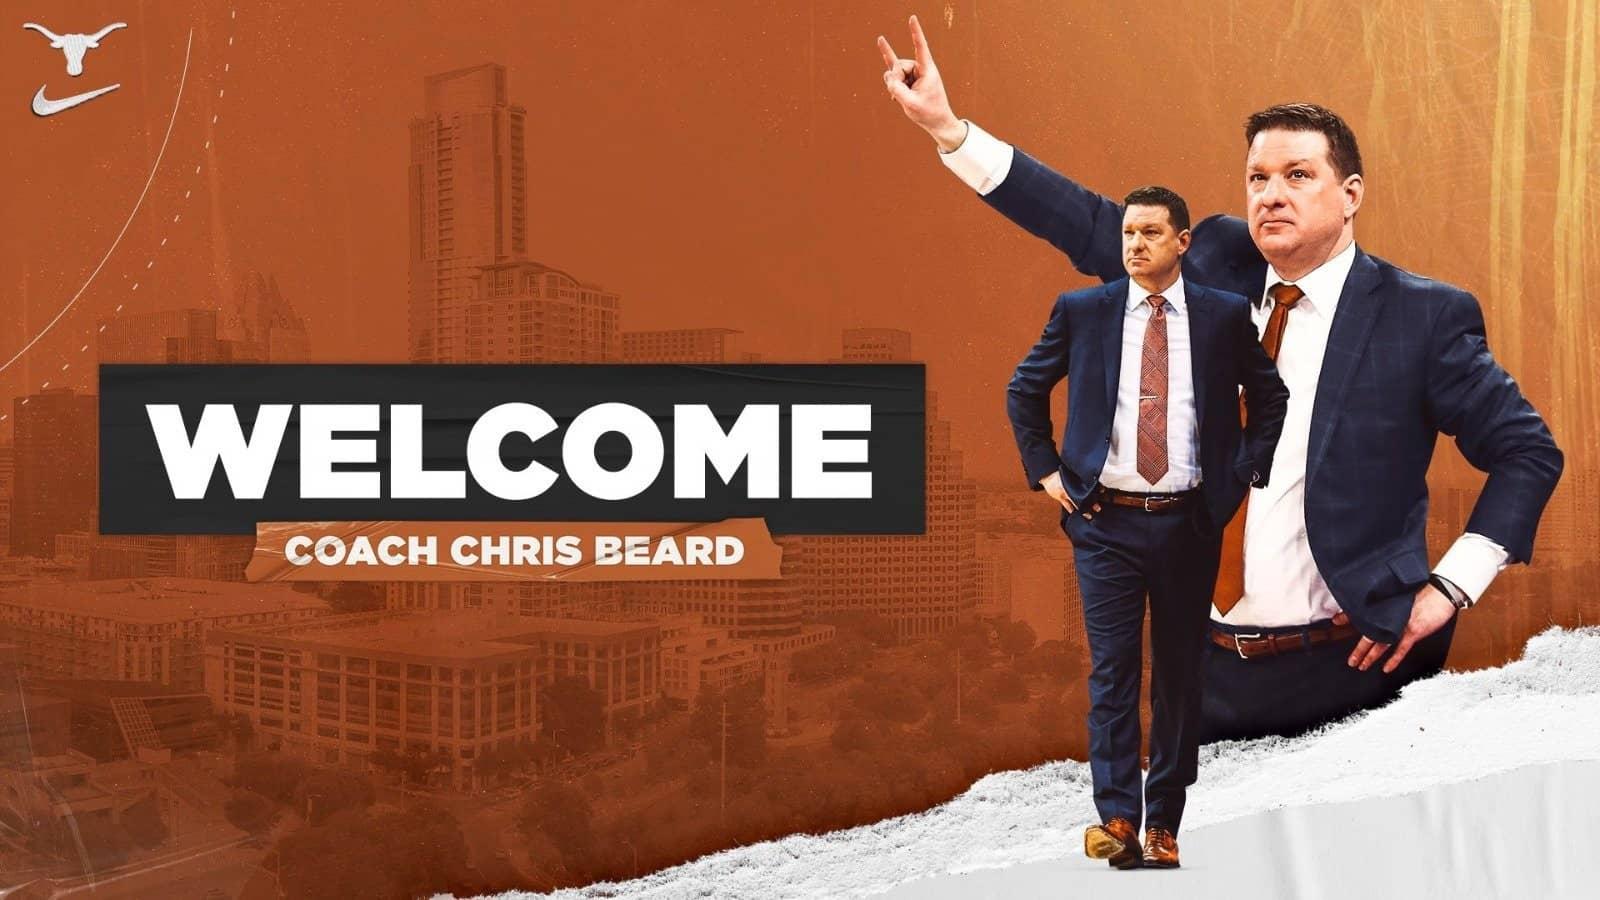 Chris Beard welcome Texas